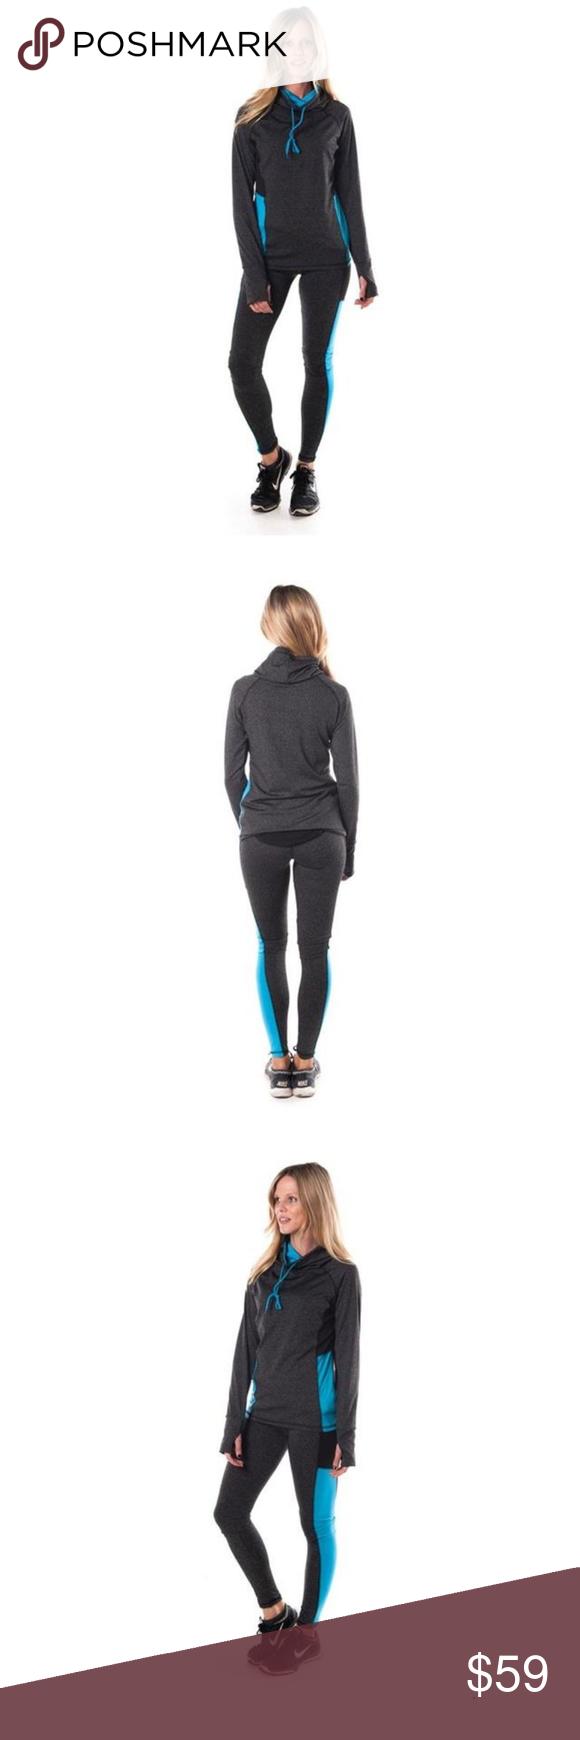 e19c37fc079 Curvy Yoga Zumba Pullover Jacket and Leggings Ladies fashion plus size  active sport yoga   zumba